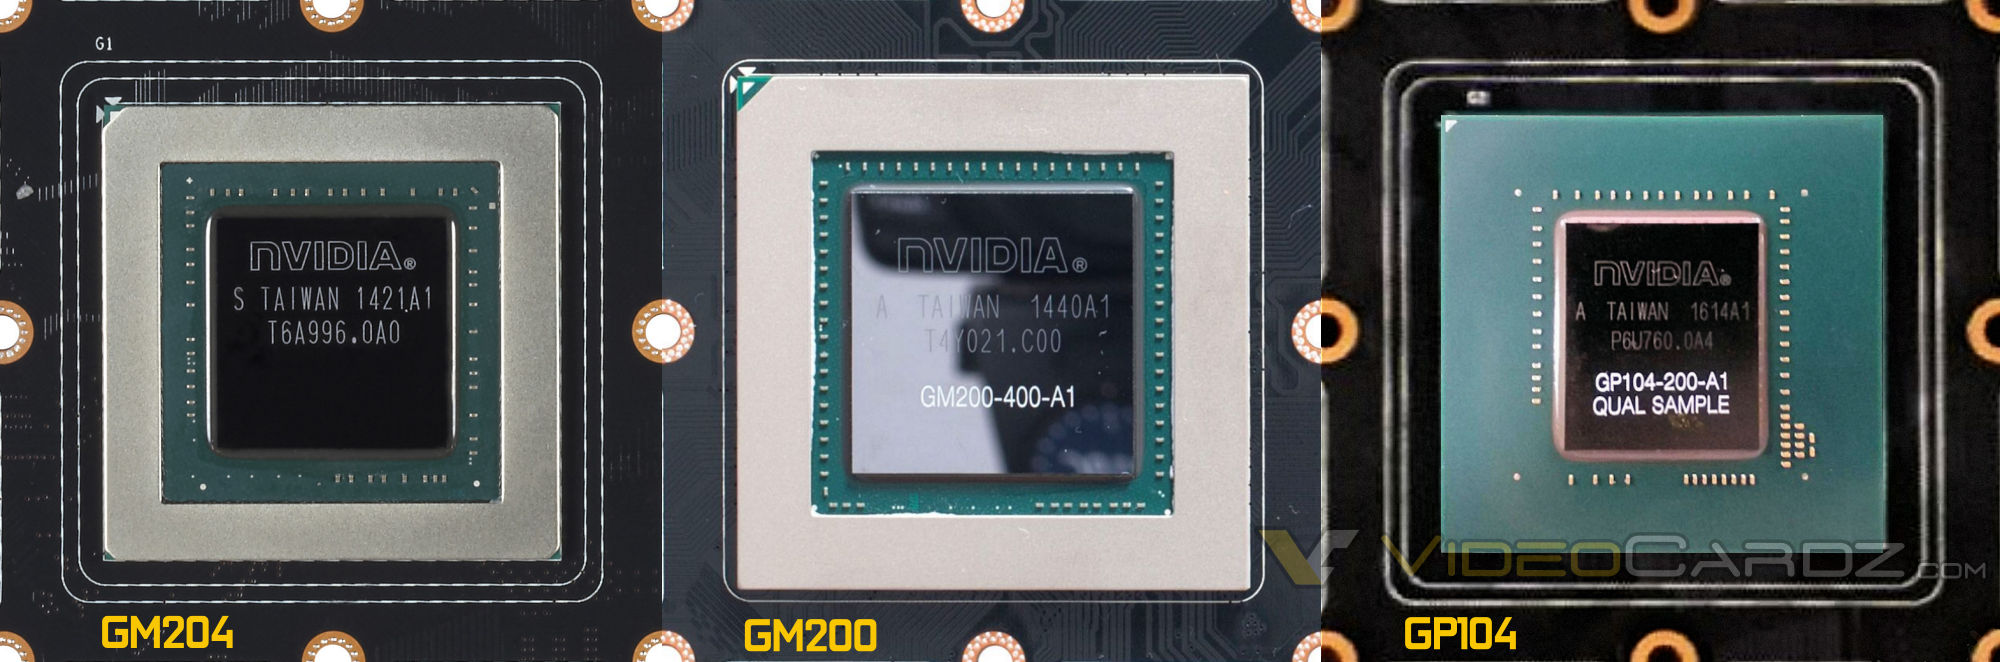 GPU Pascal GP104